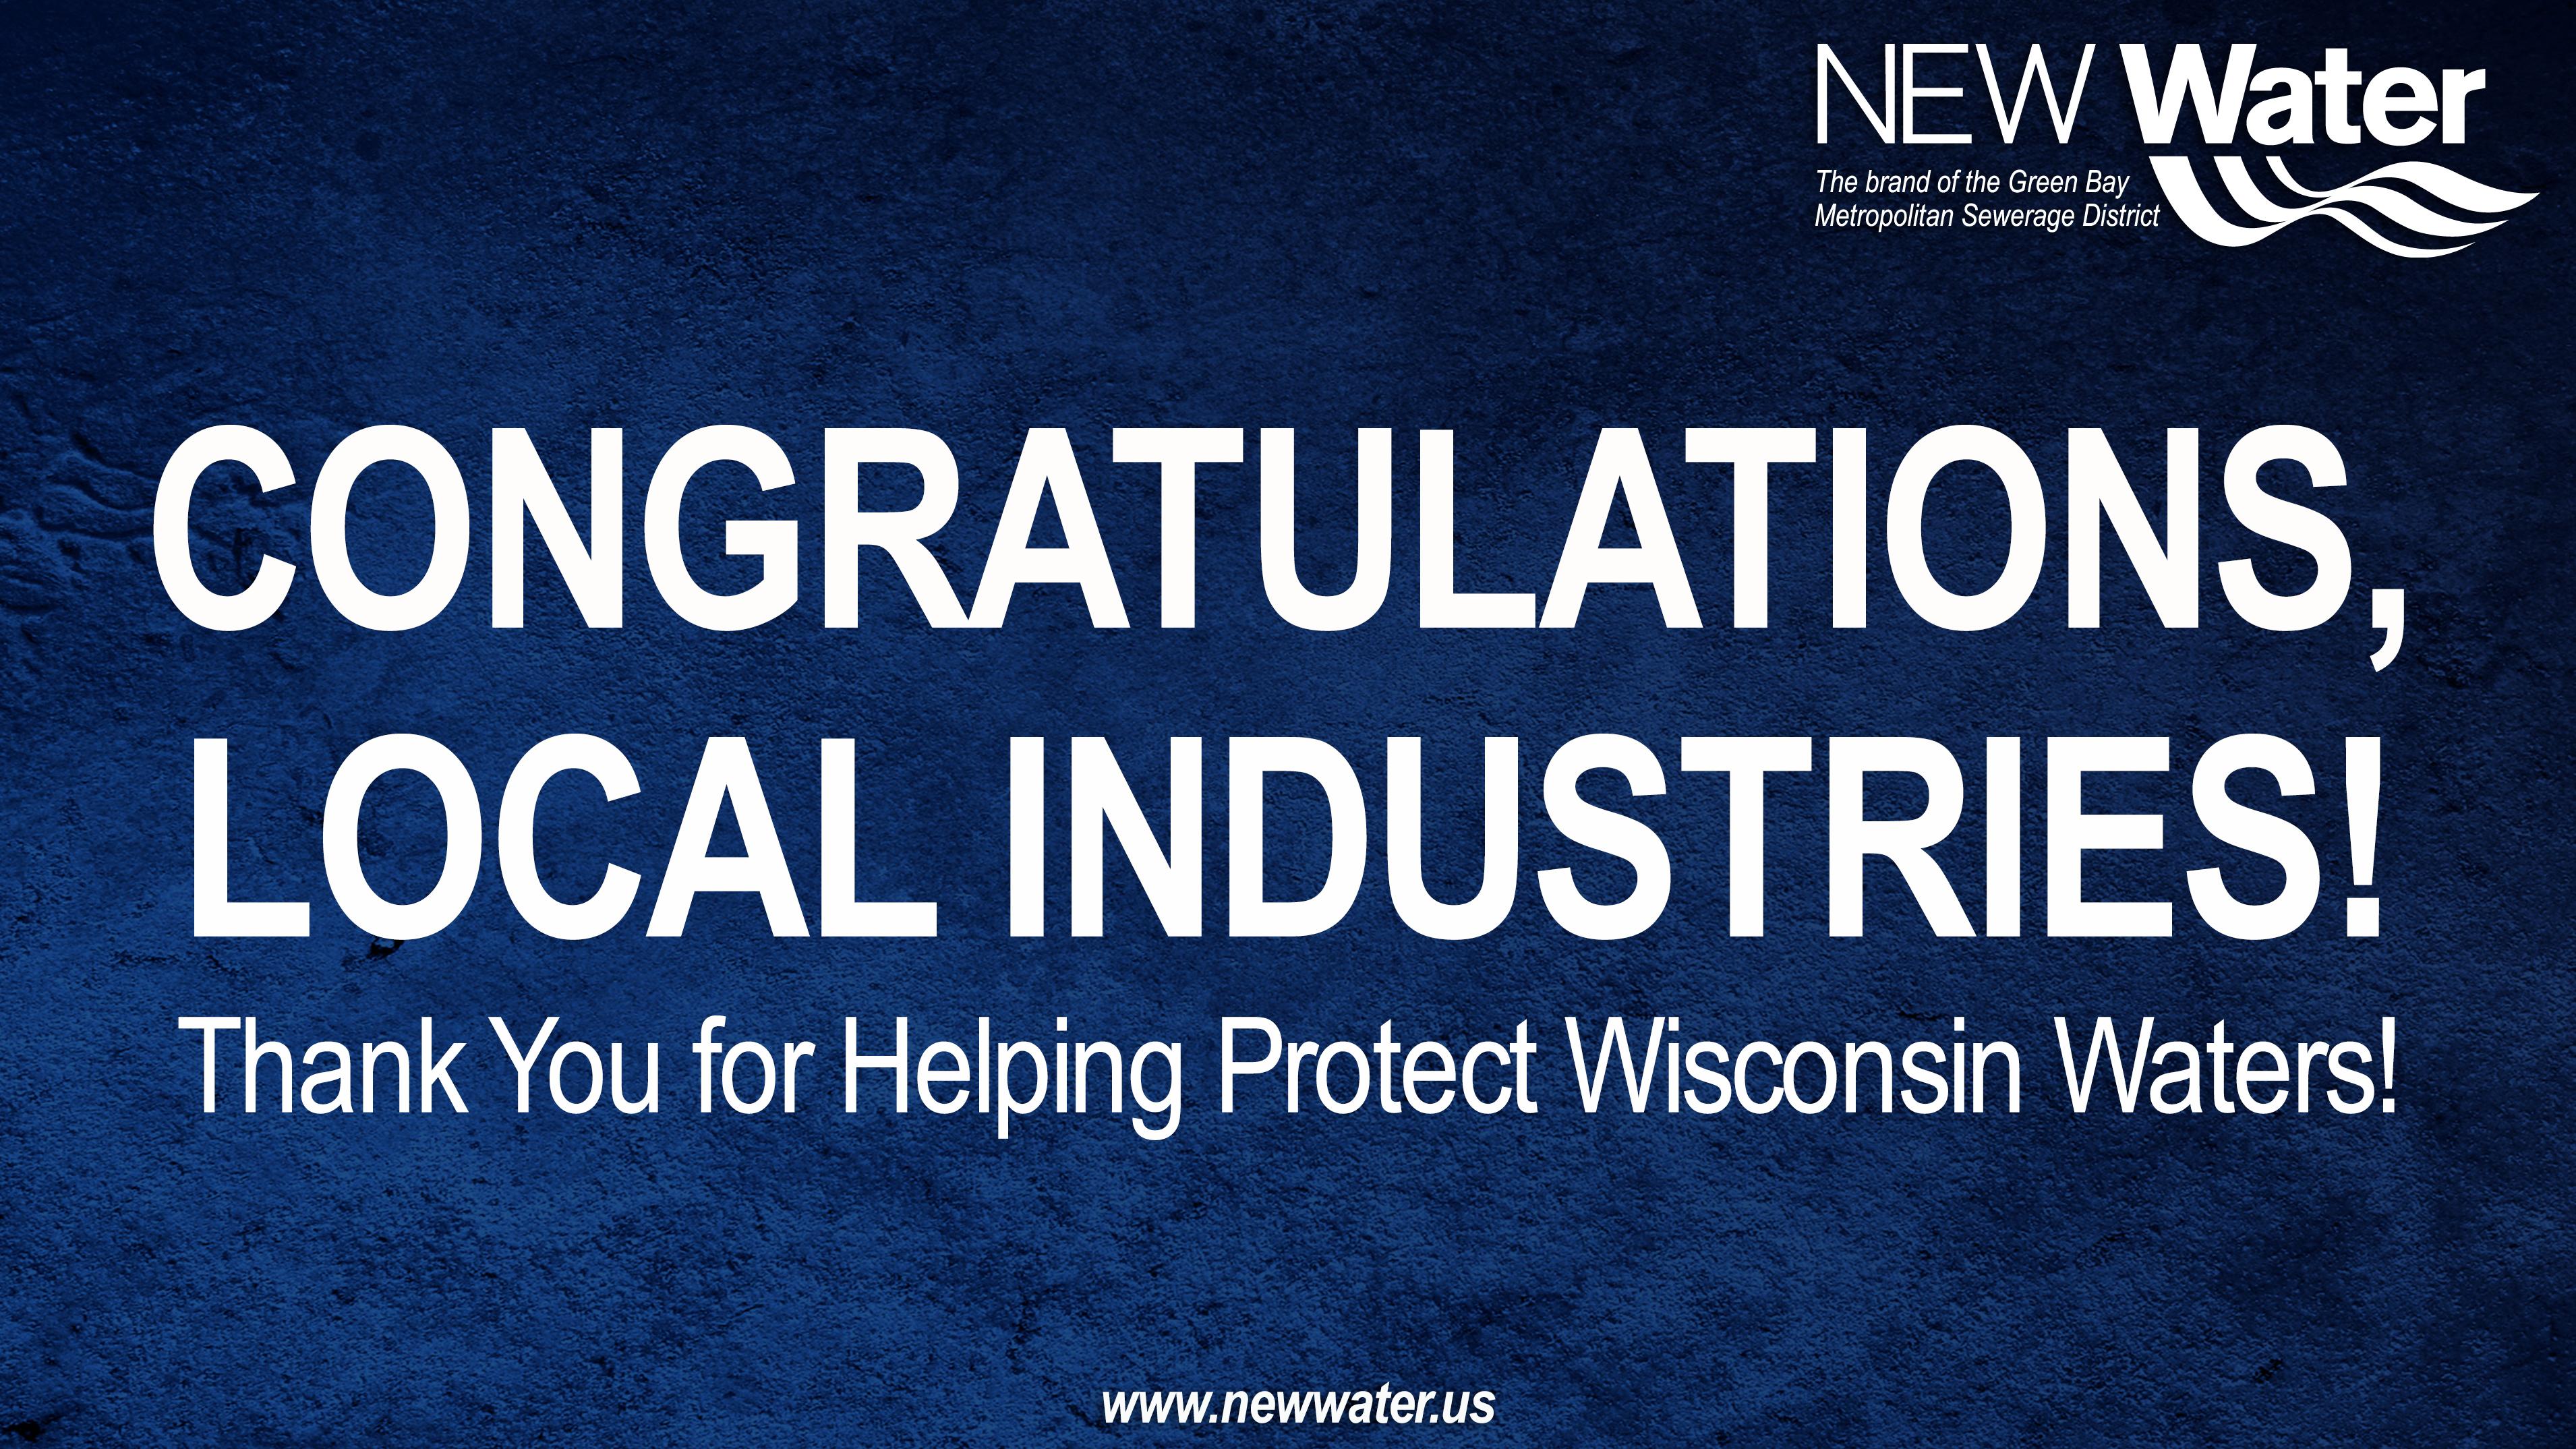 Congratulations, Local Industries